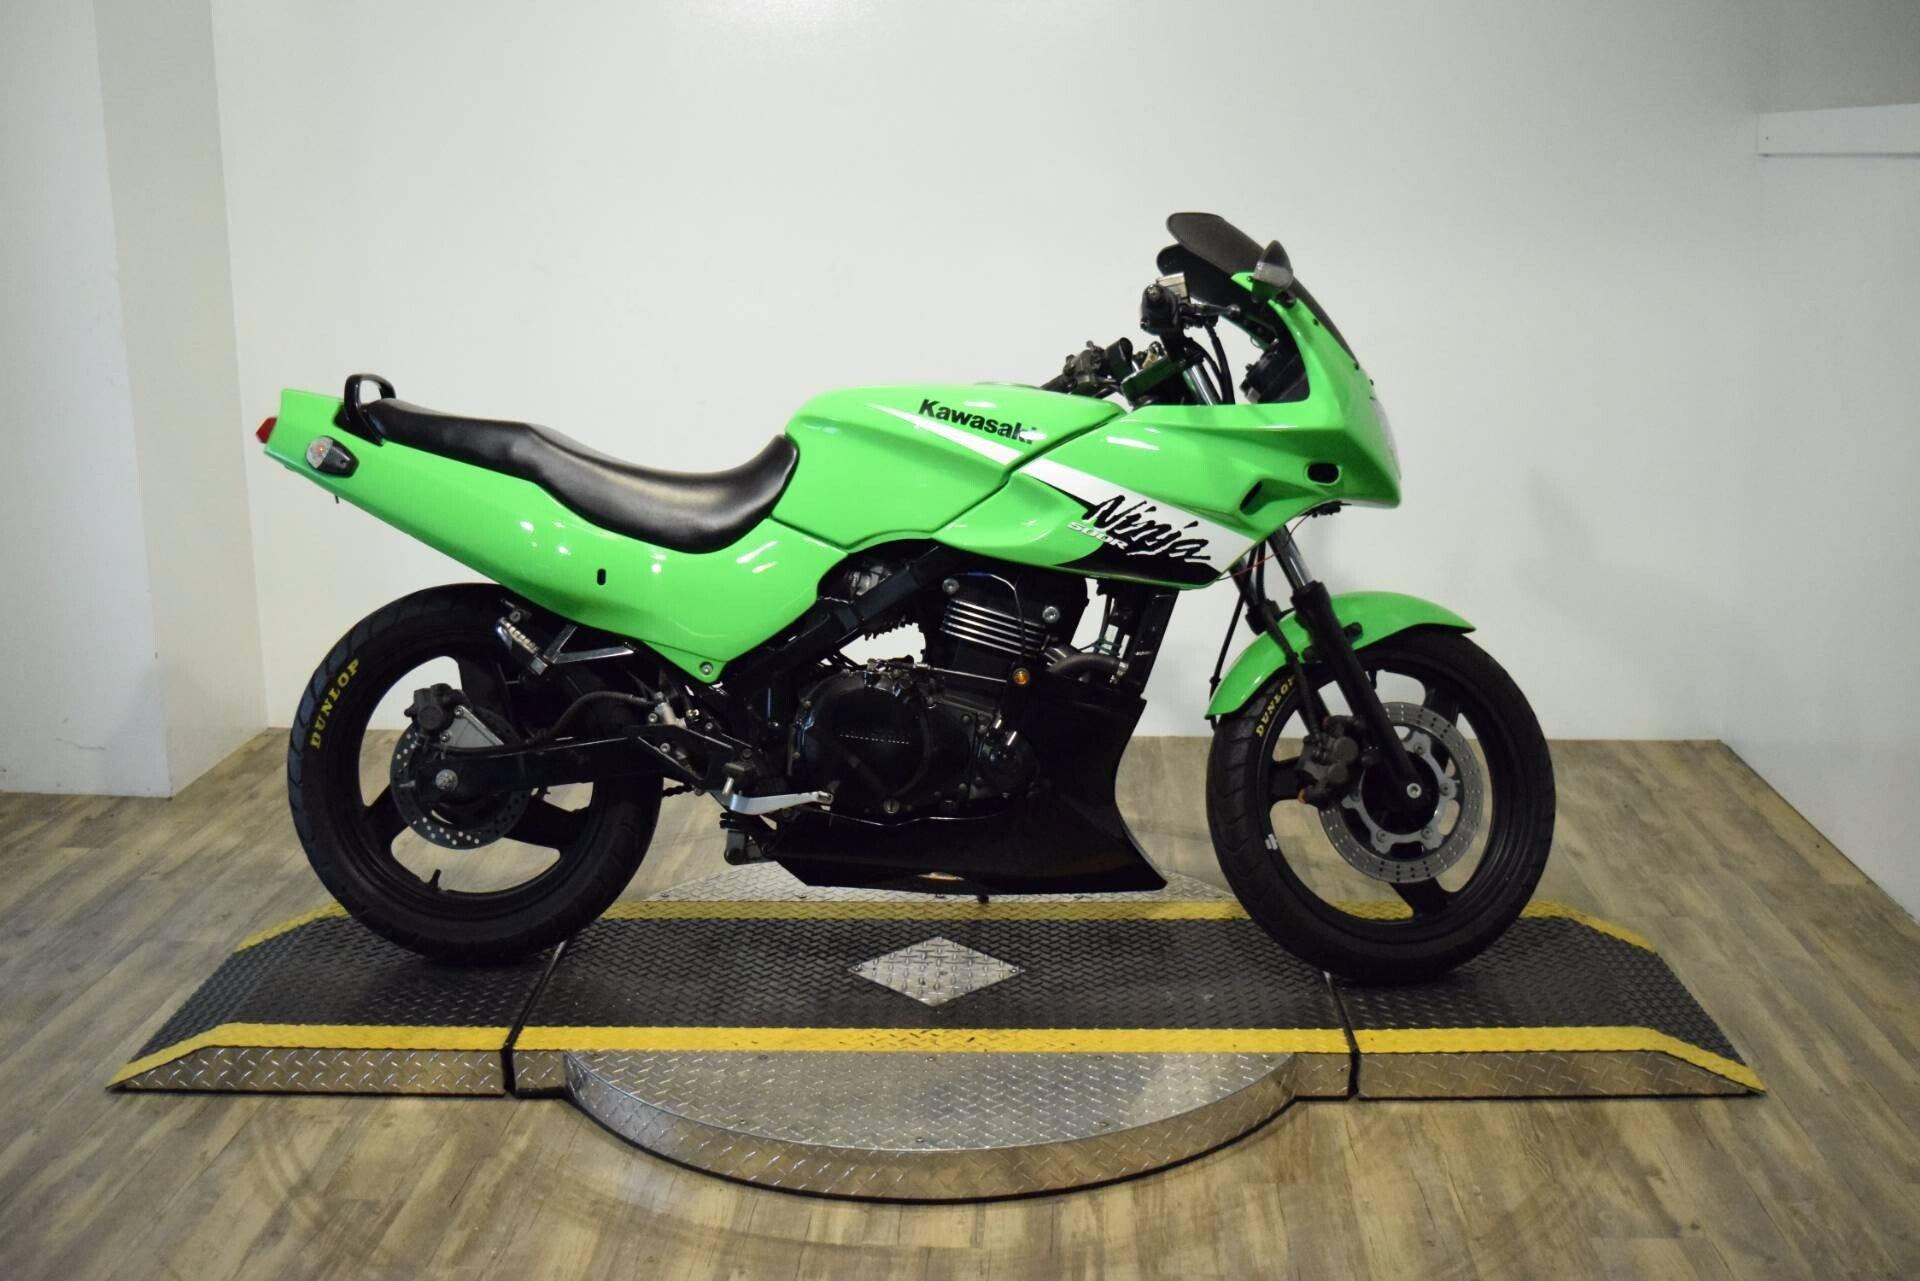 2012 Kawasaki Ninja 650r Wiring Diagram Schematic Diagrams Free Download 2011